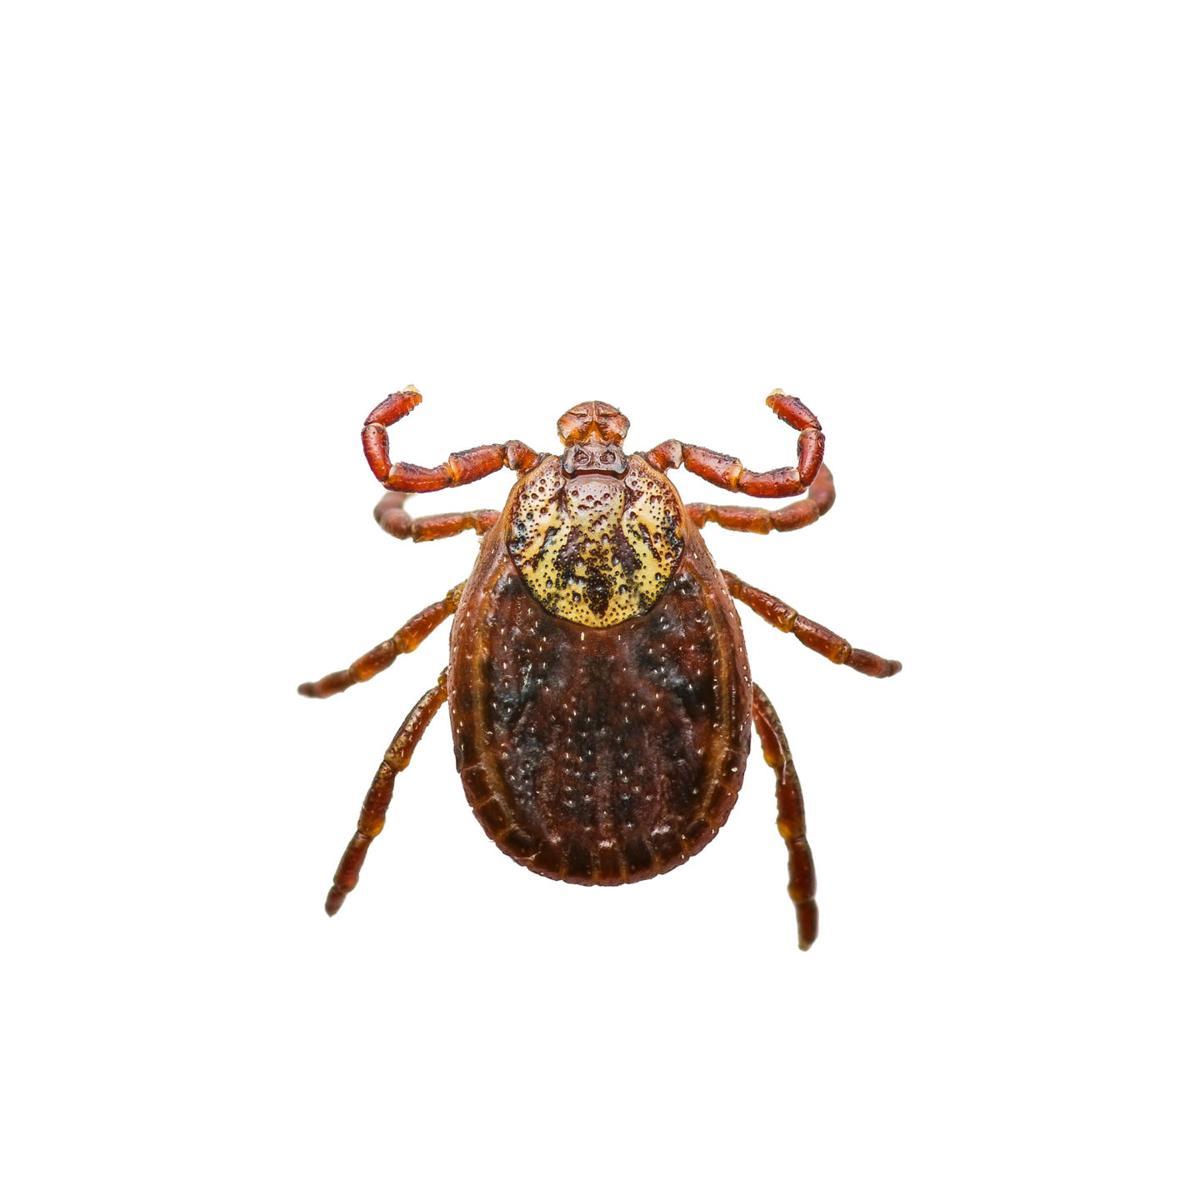 Prevent illness by preventing tick bites